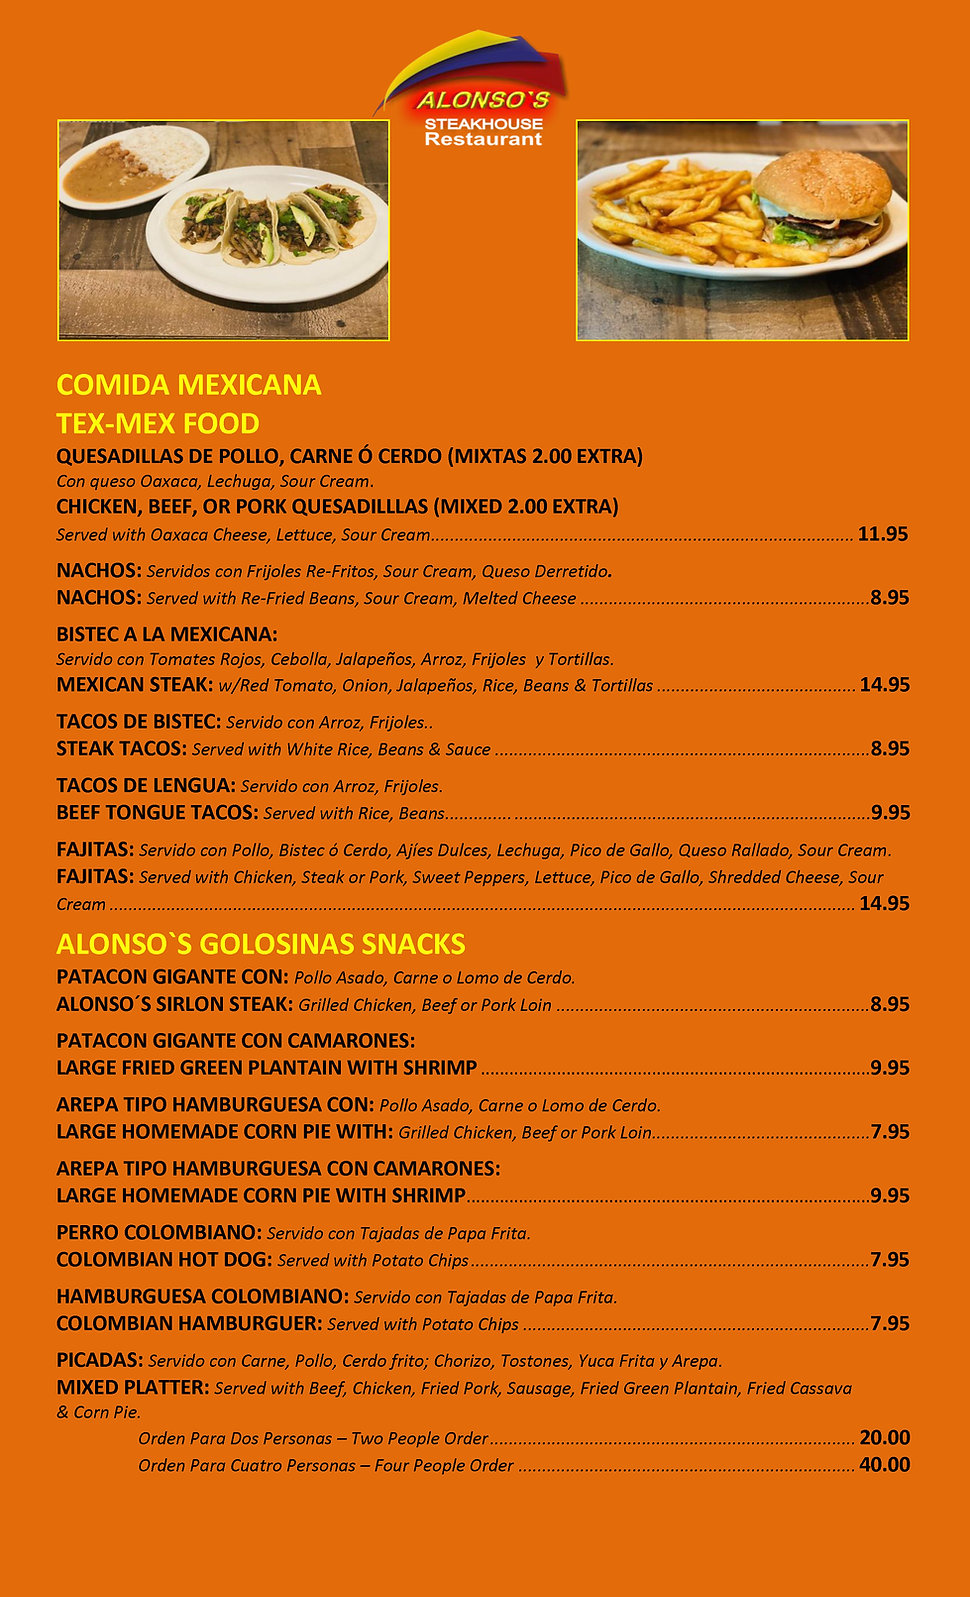 menucomidamexicana2.jpg